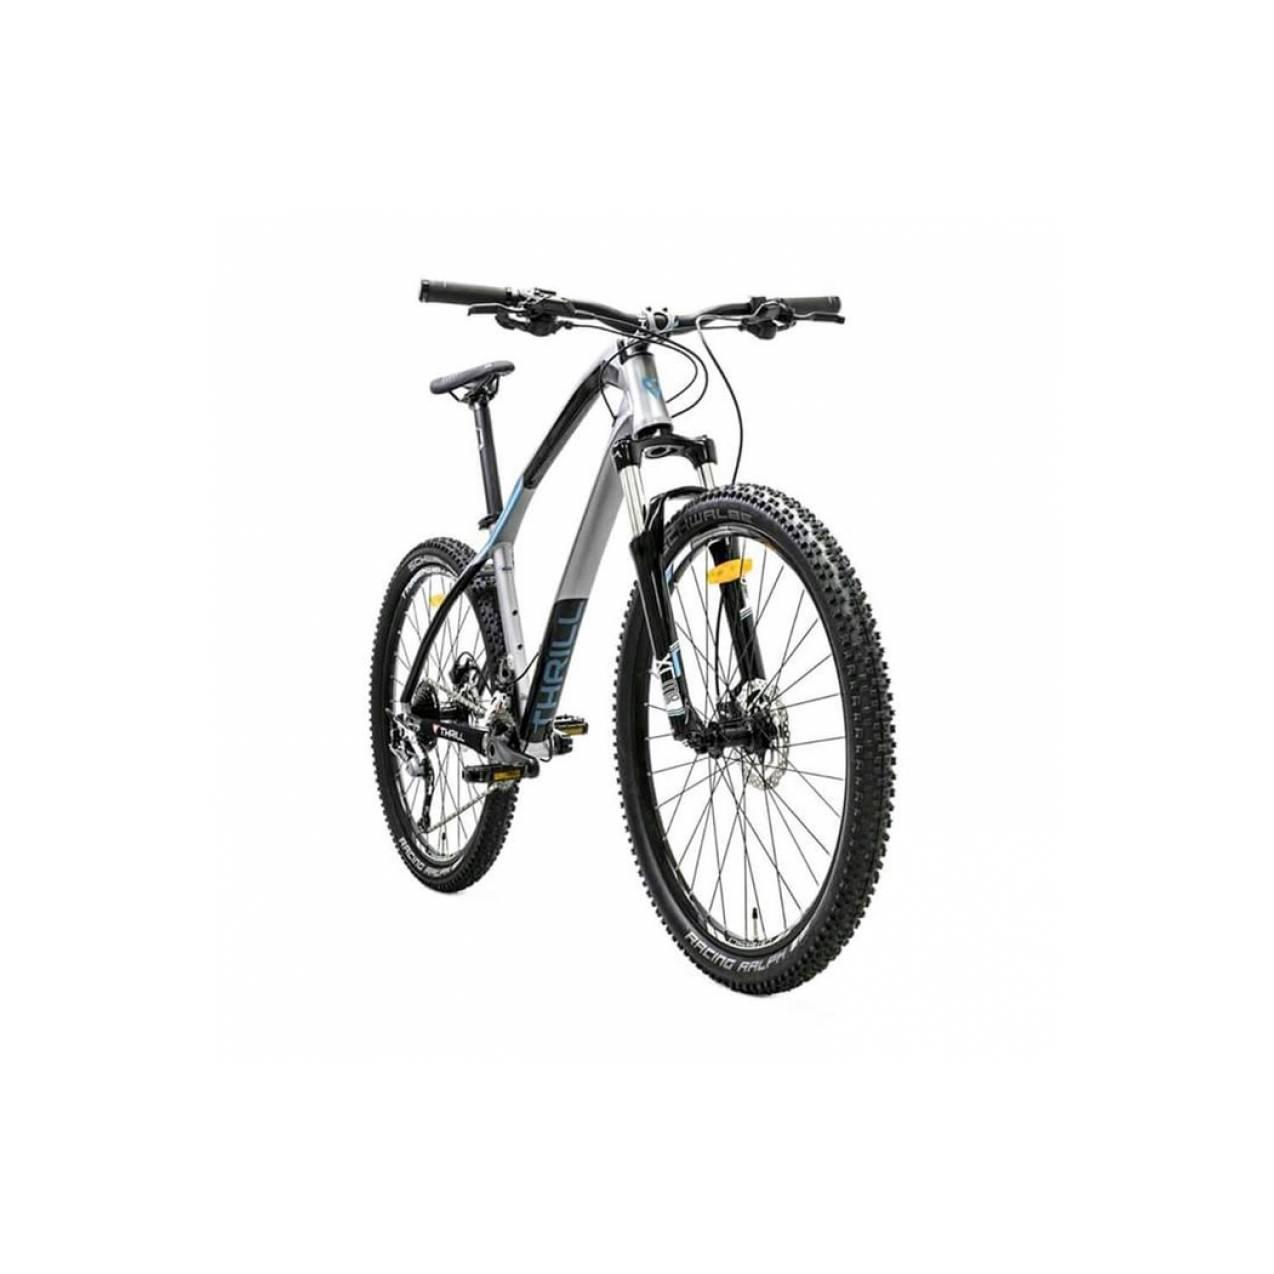 Sepeda Gunung MTB 27.5 Thrill Ravage 5.0 Terbaru